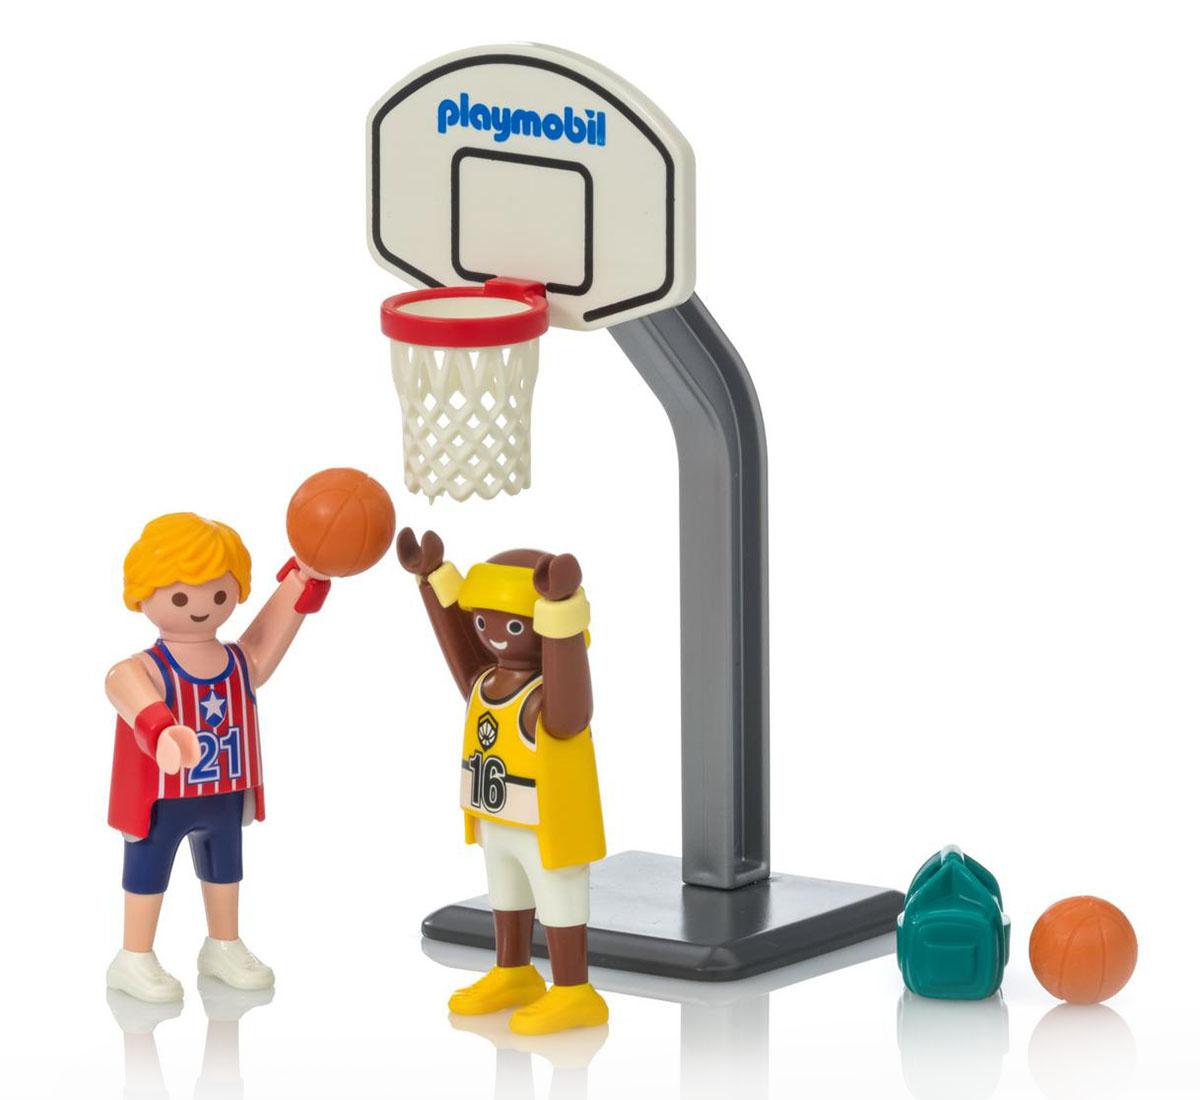 Playmobil Игровой набор Яйцо Баскетбол один на один #1